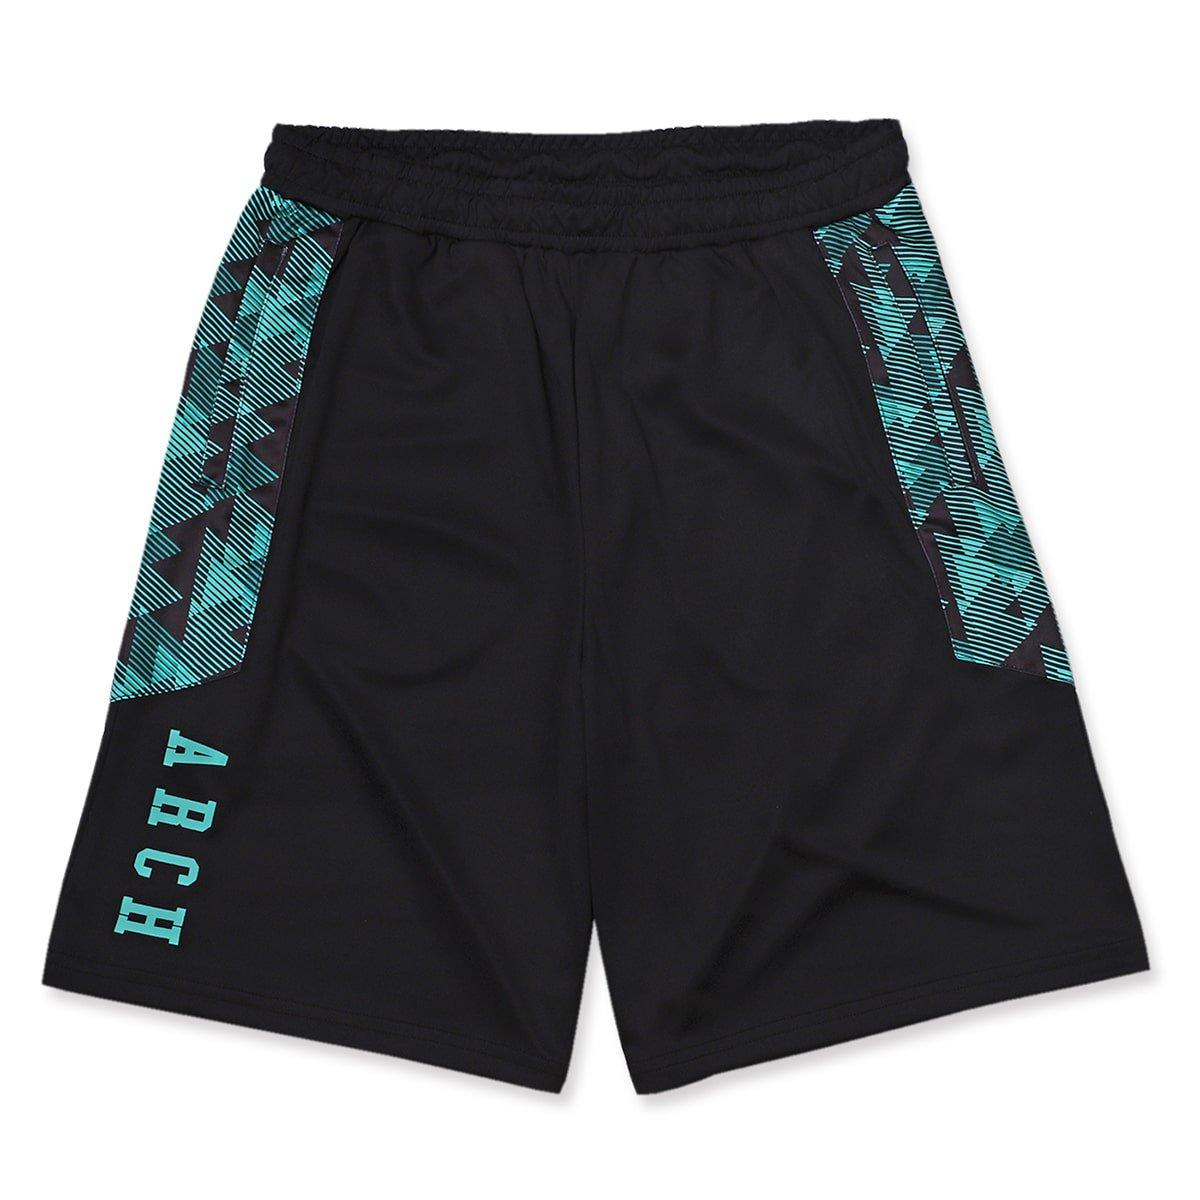 triangle native shorts【black】